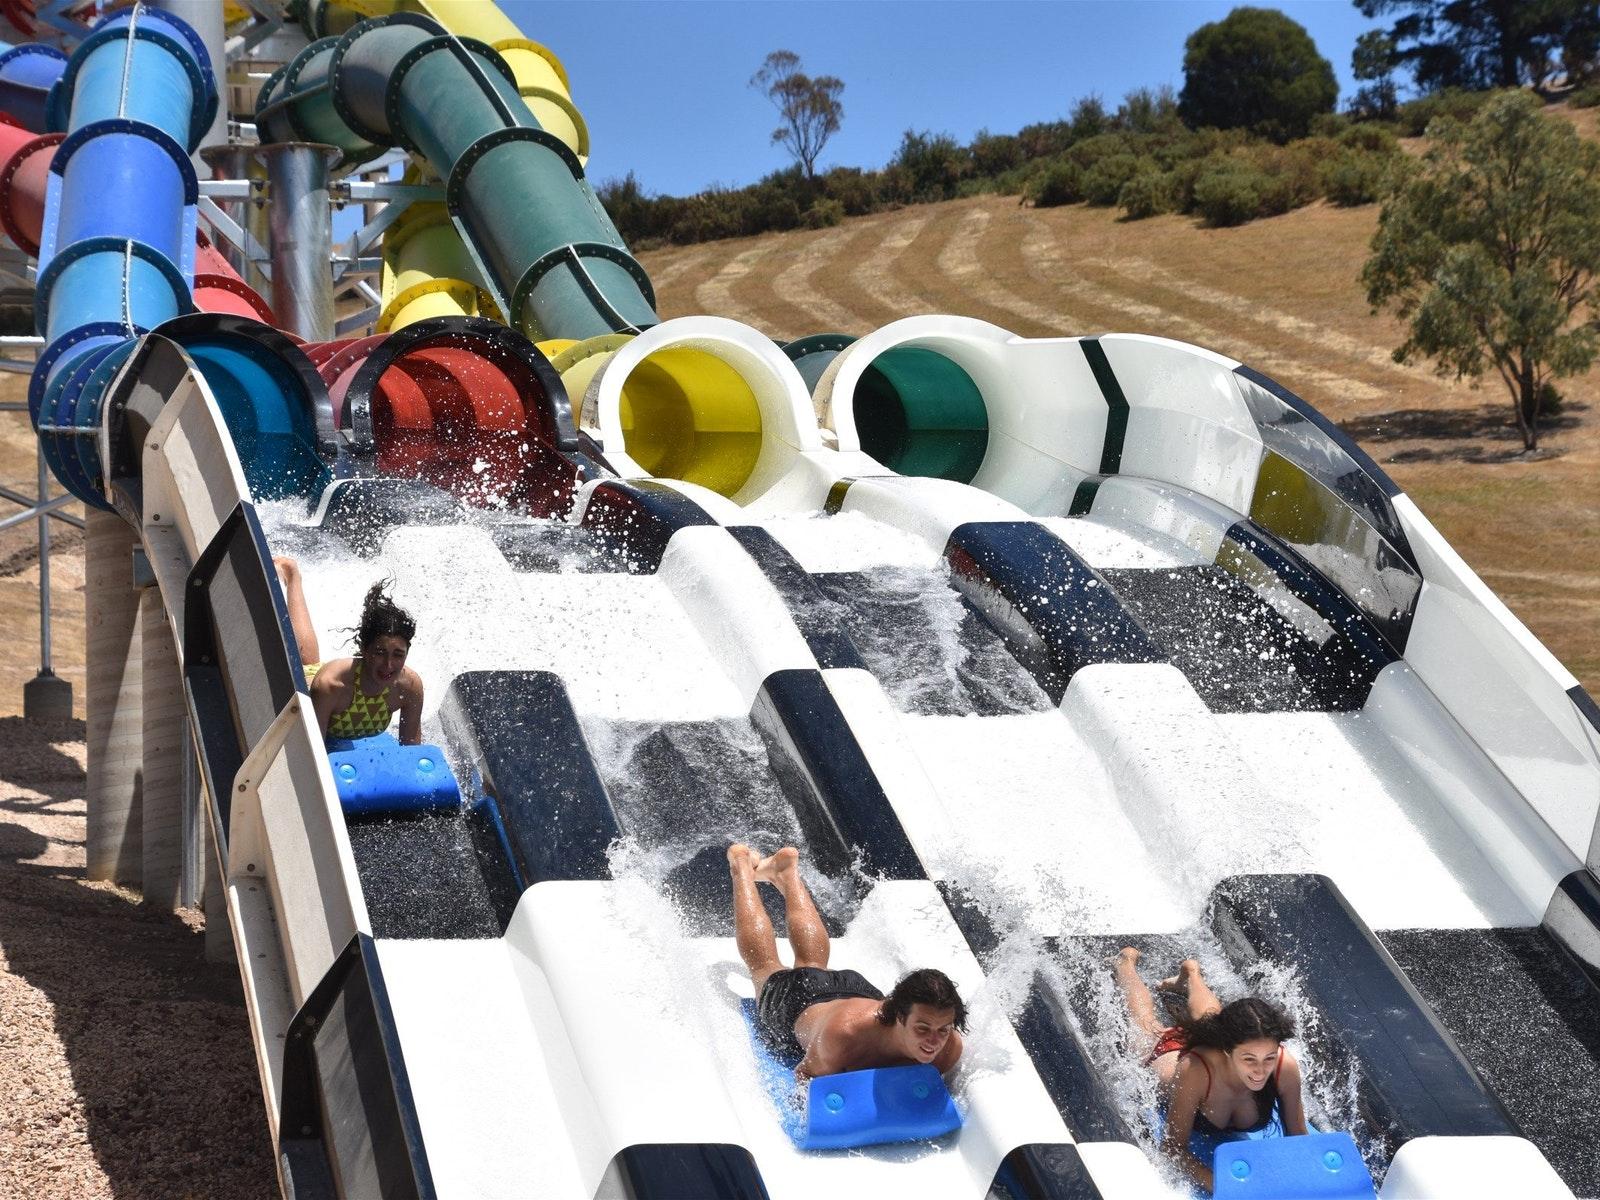 Family activities, Melbourne, Victoria, Australia